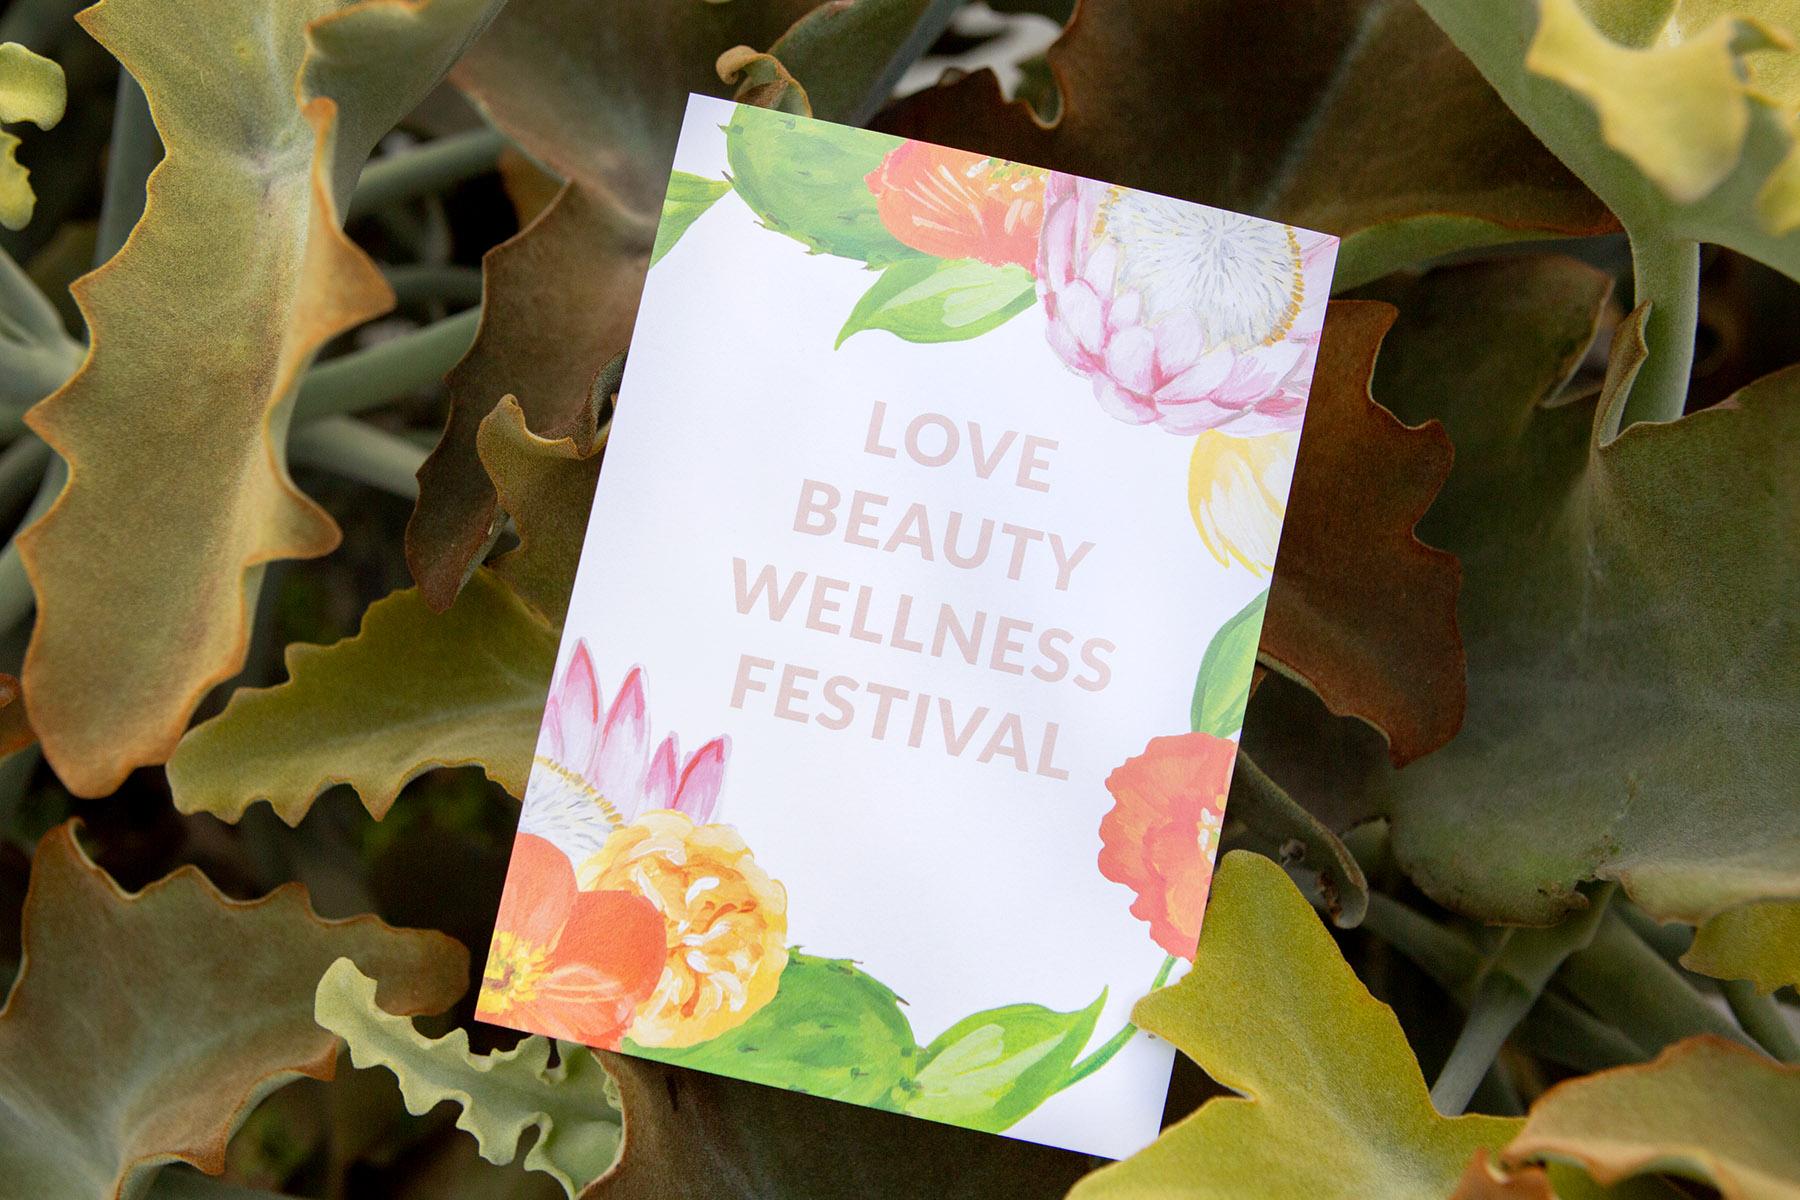 Love Beauty Wellness Festival Flyer